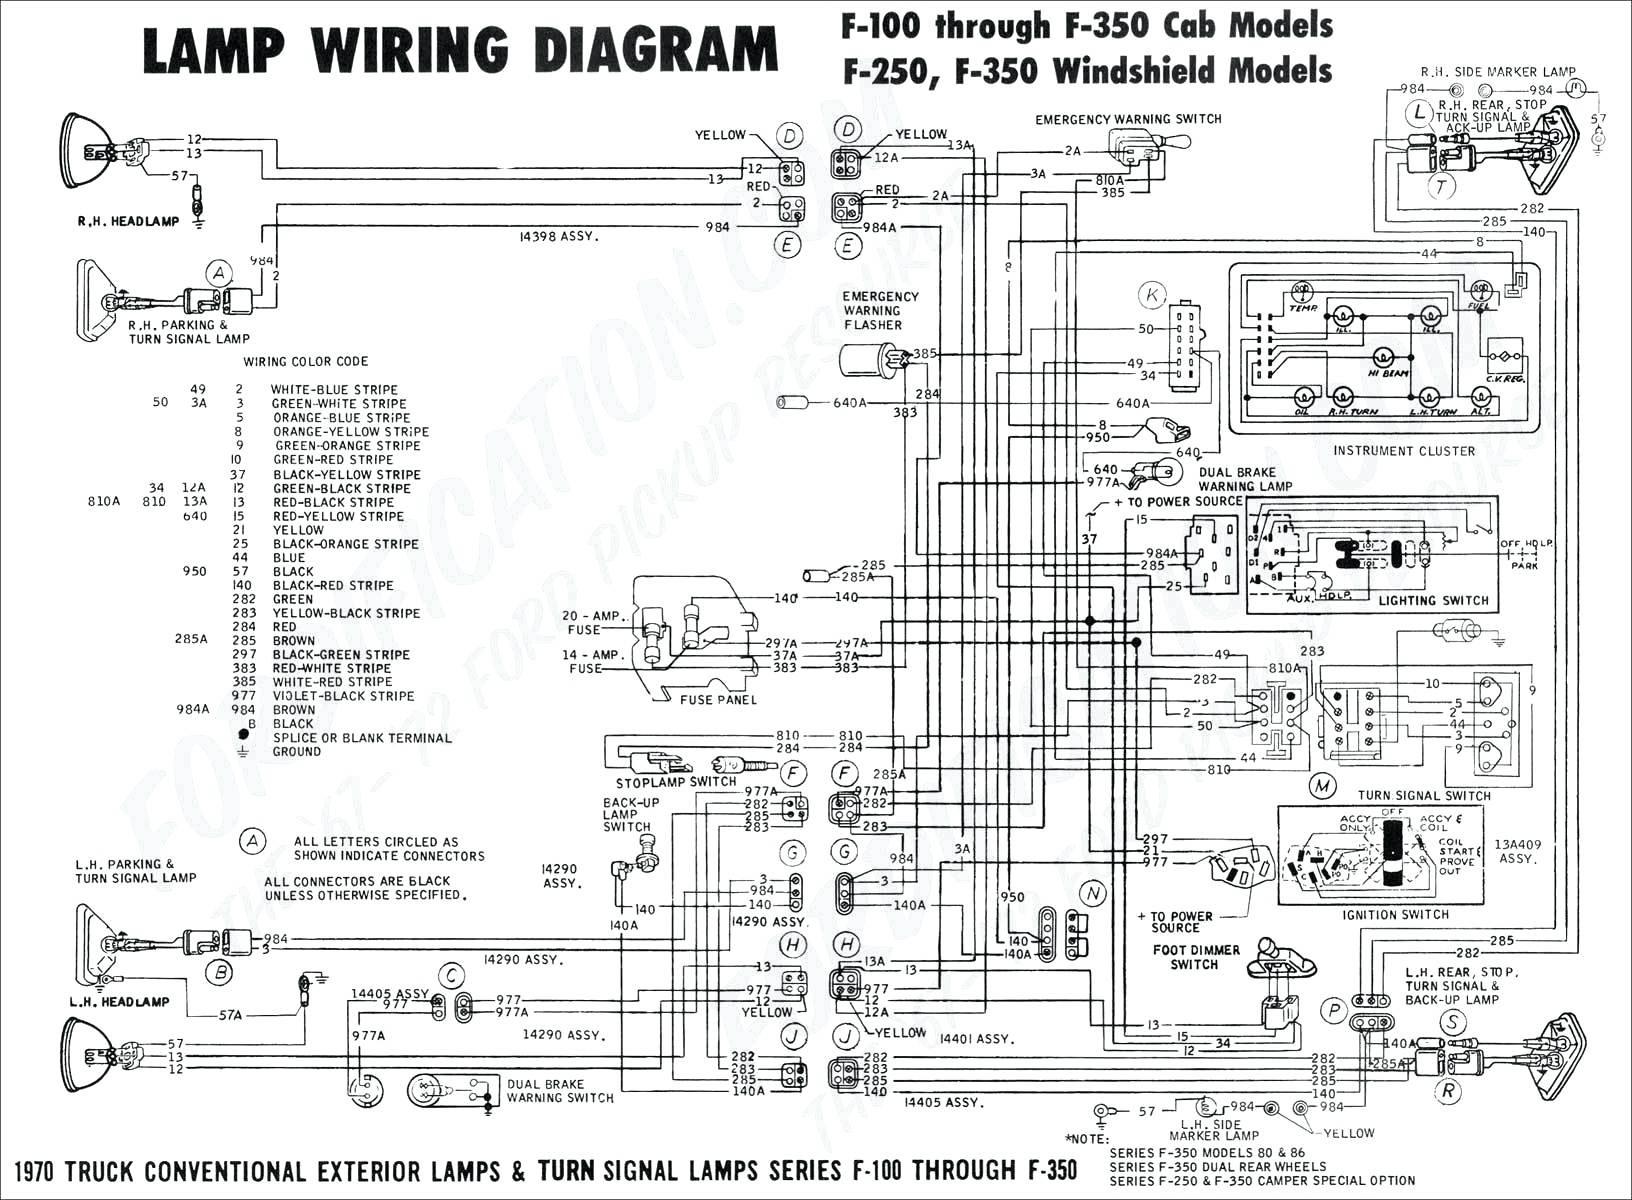 Wiring Diagram for 7 Wire Trailer Plug 450 Fuse Box Diagram Moreover 7 Wire Trailer Wiring Diagram as Of Wiring Diagram for 7 Wire Trailer Plug